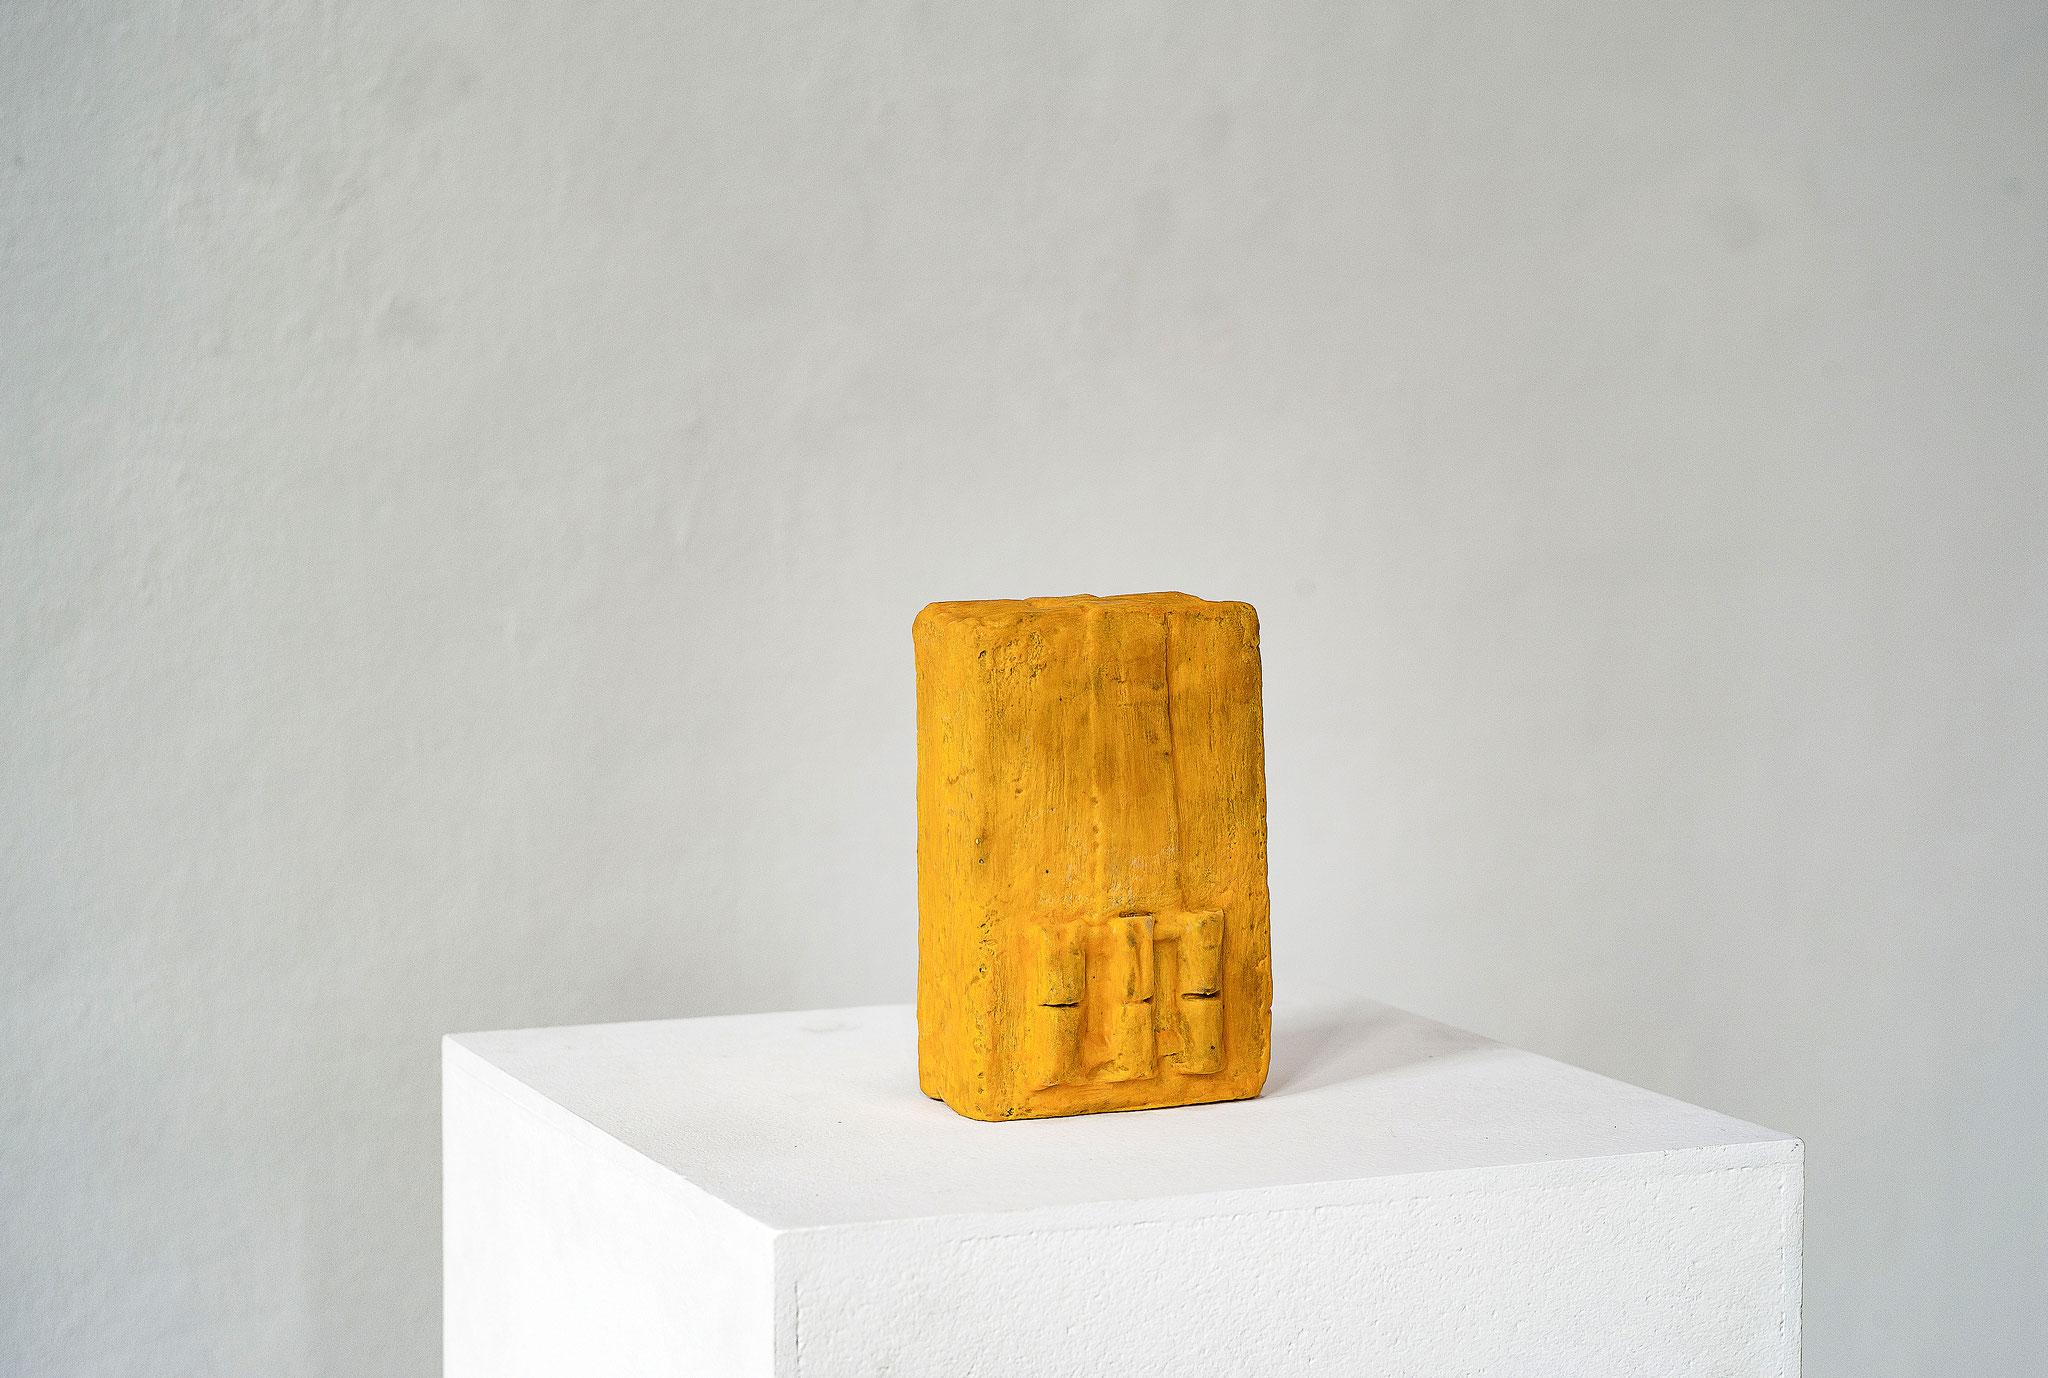 Schwarzbauten Nr .4 2016  Betonguss, Wachs, Pigment 18 x 15 x 17 cm